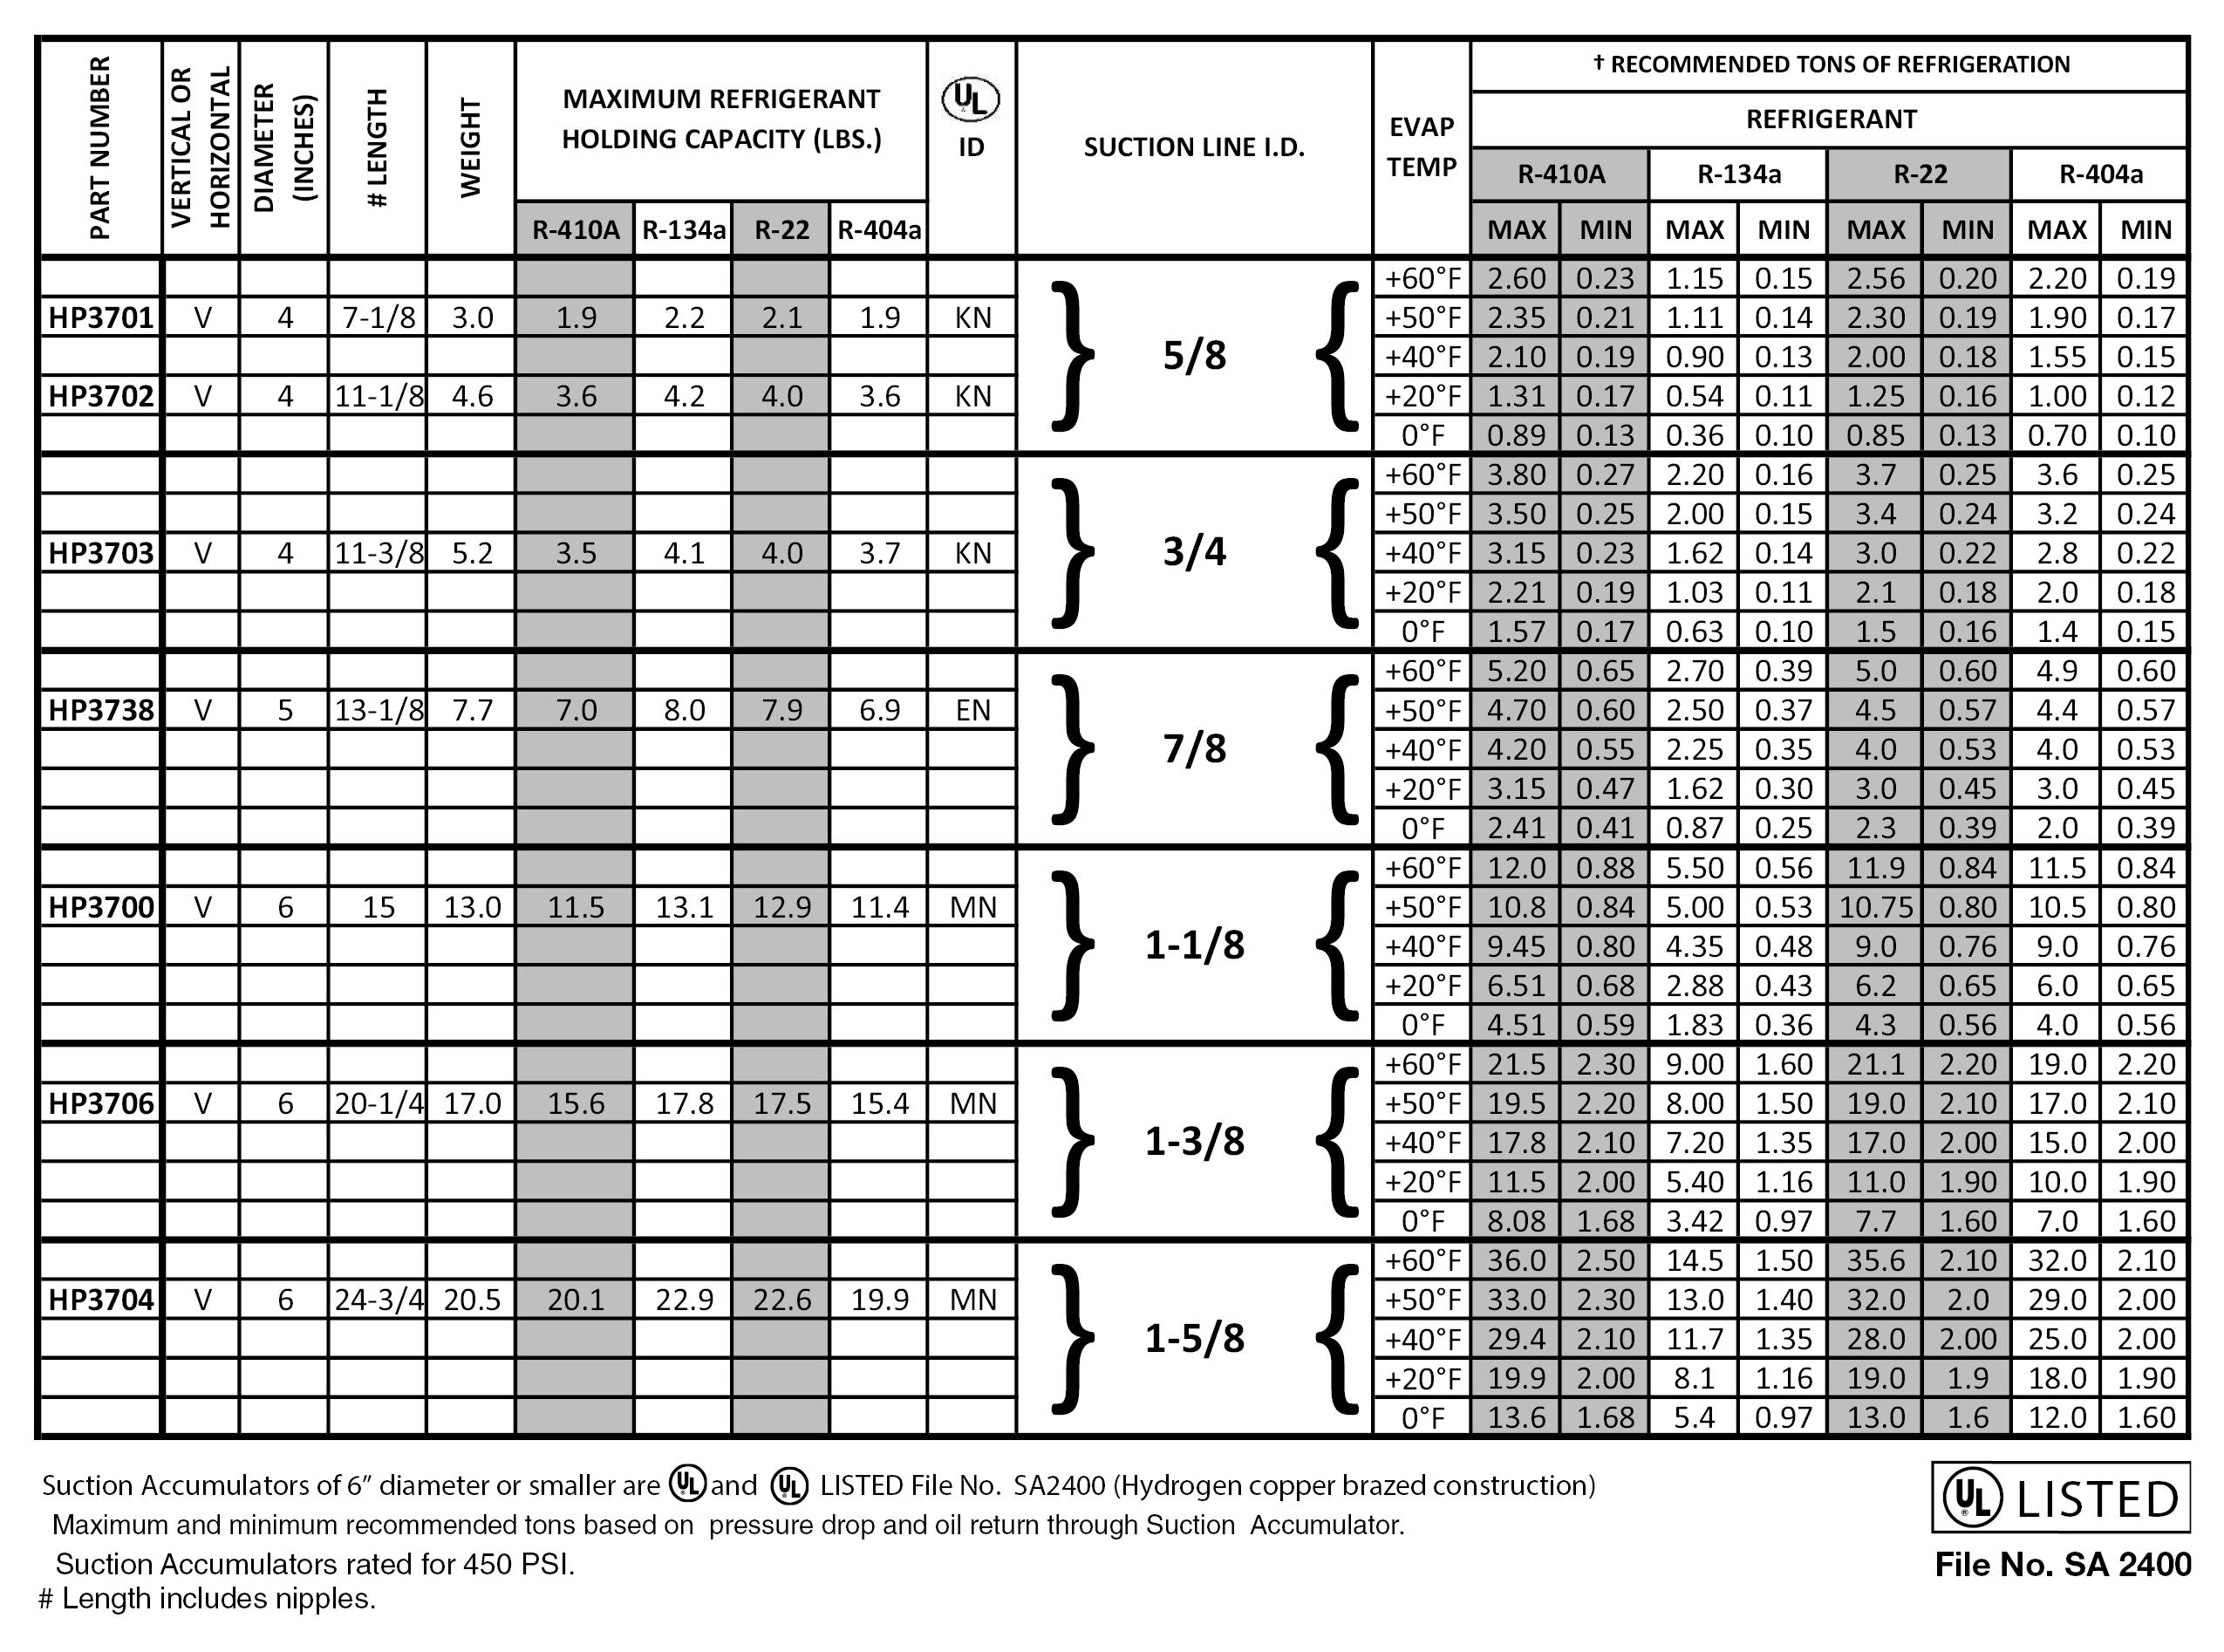 Suction Accumulators - Heat Pump Data